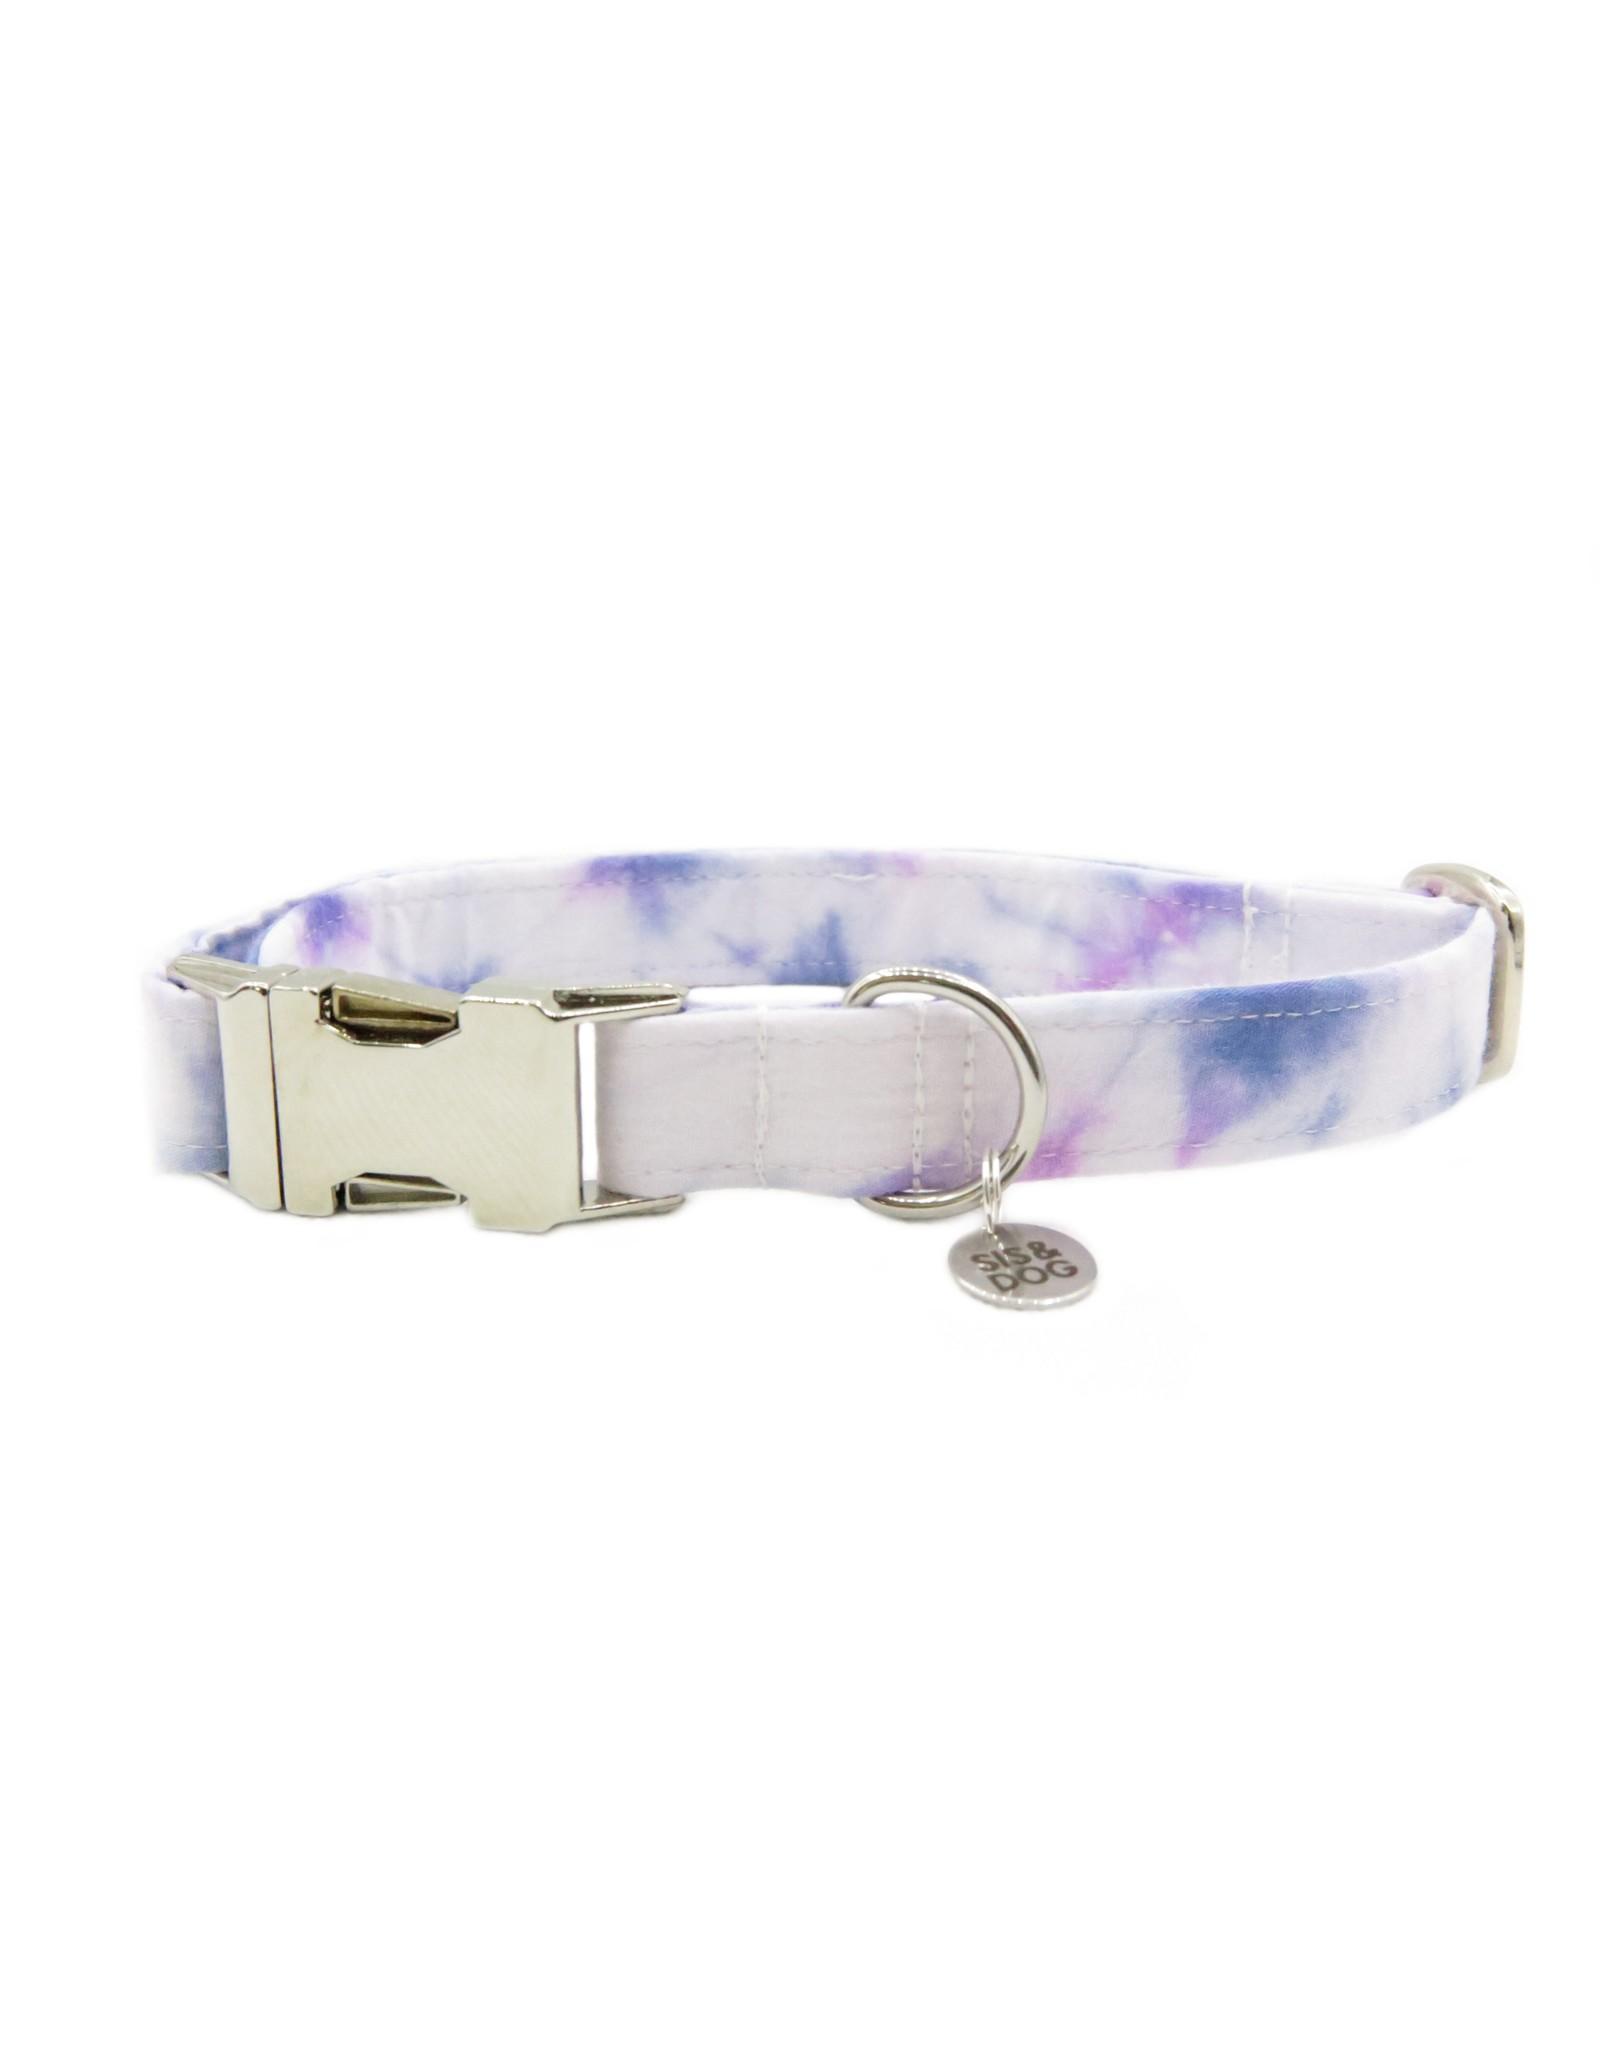 Marble collar